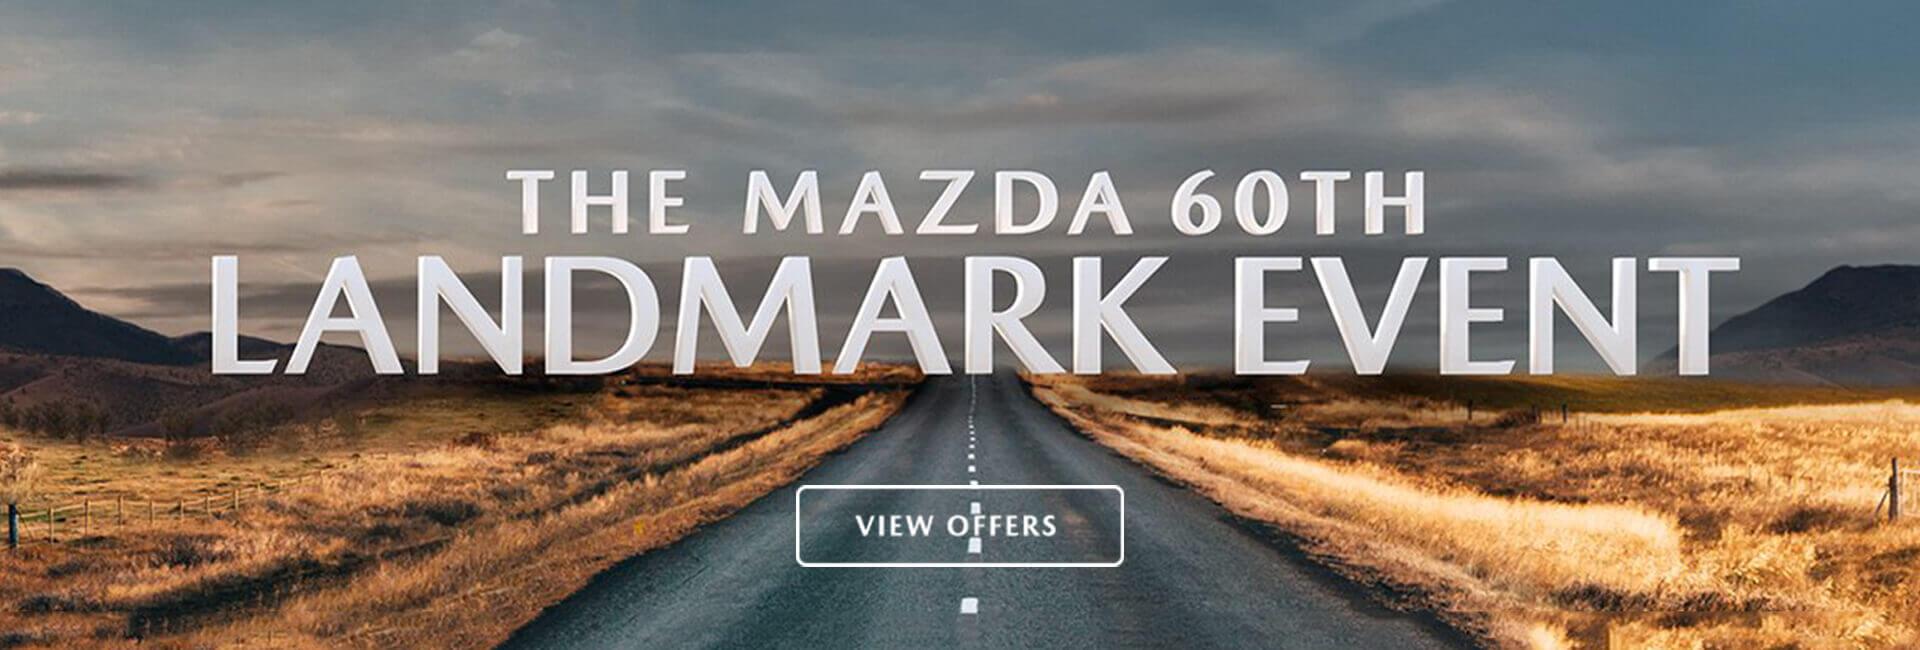 The Mazda 60th Landmark Event.